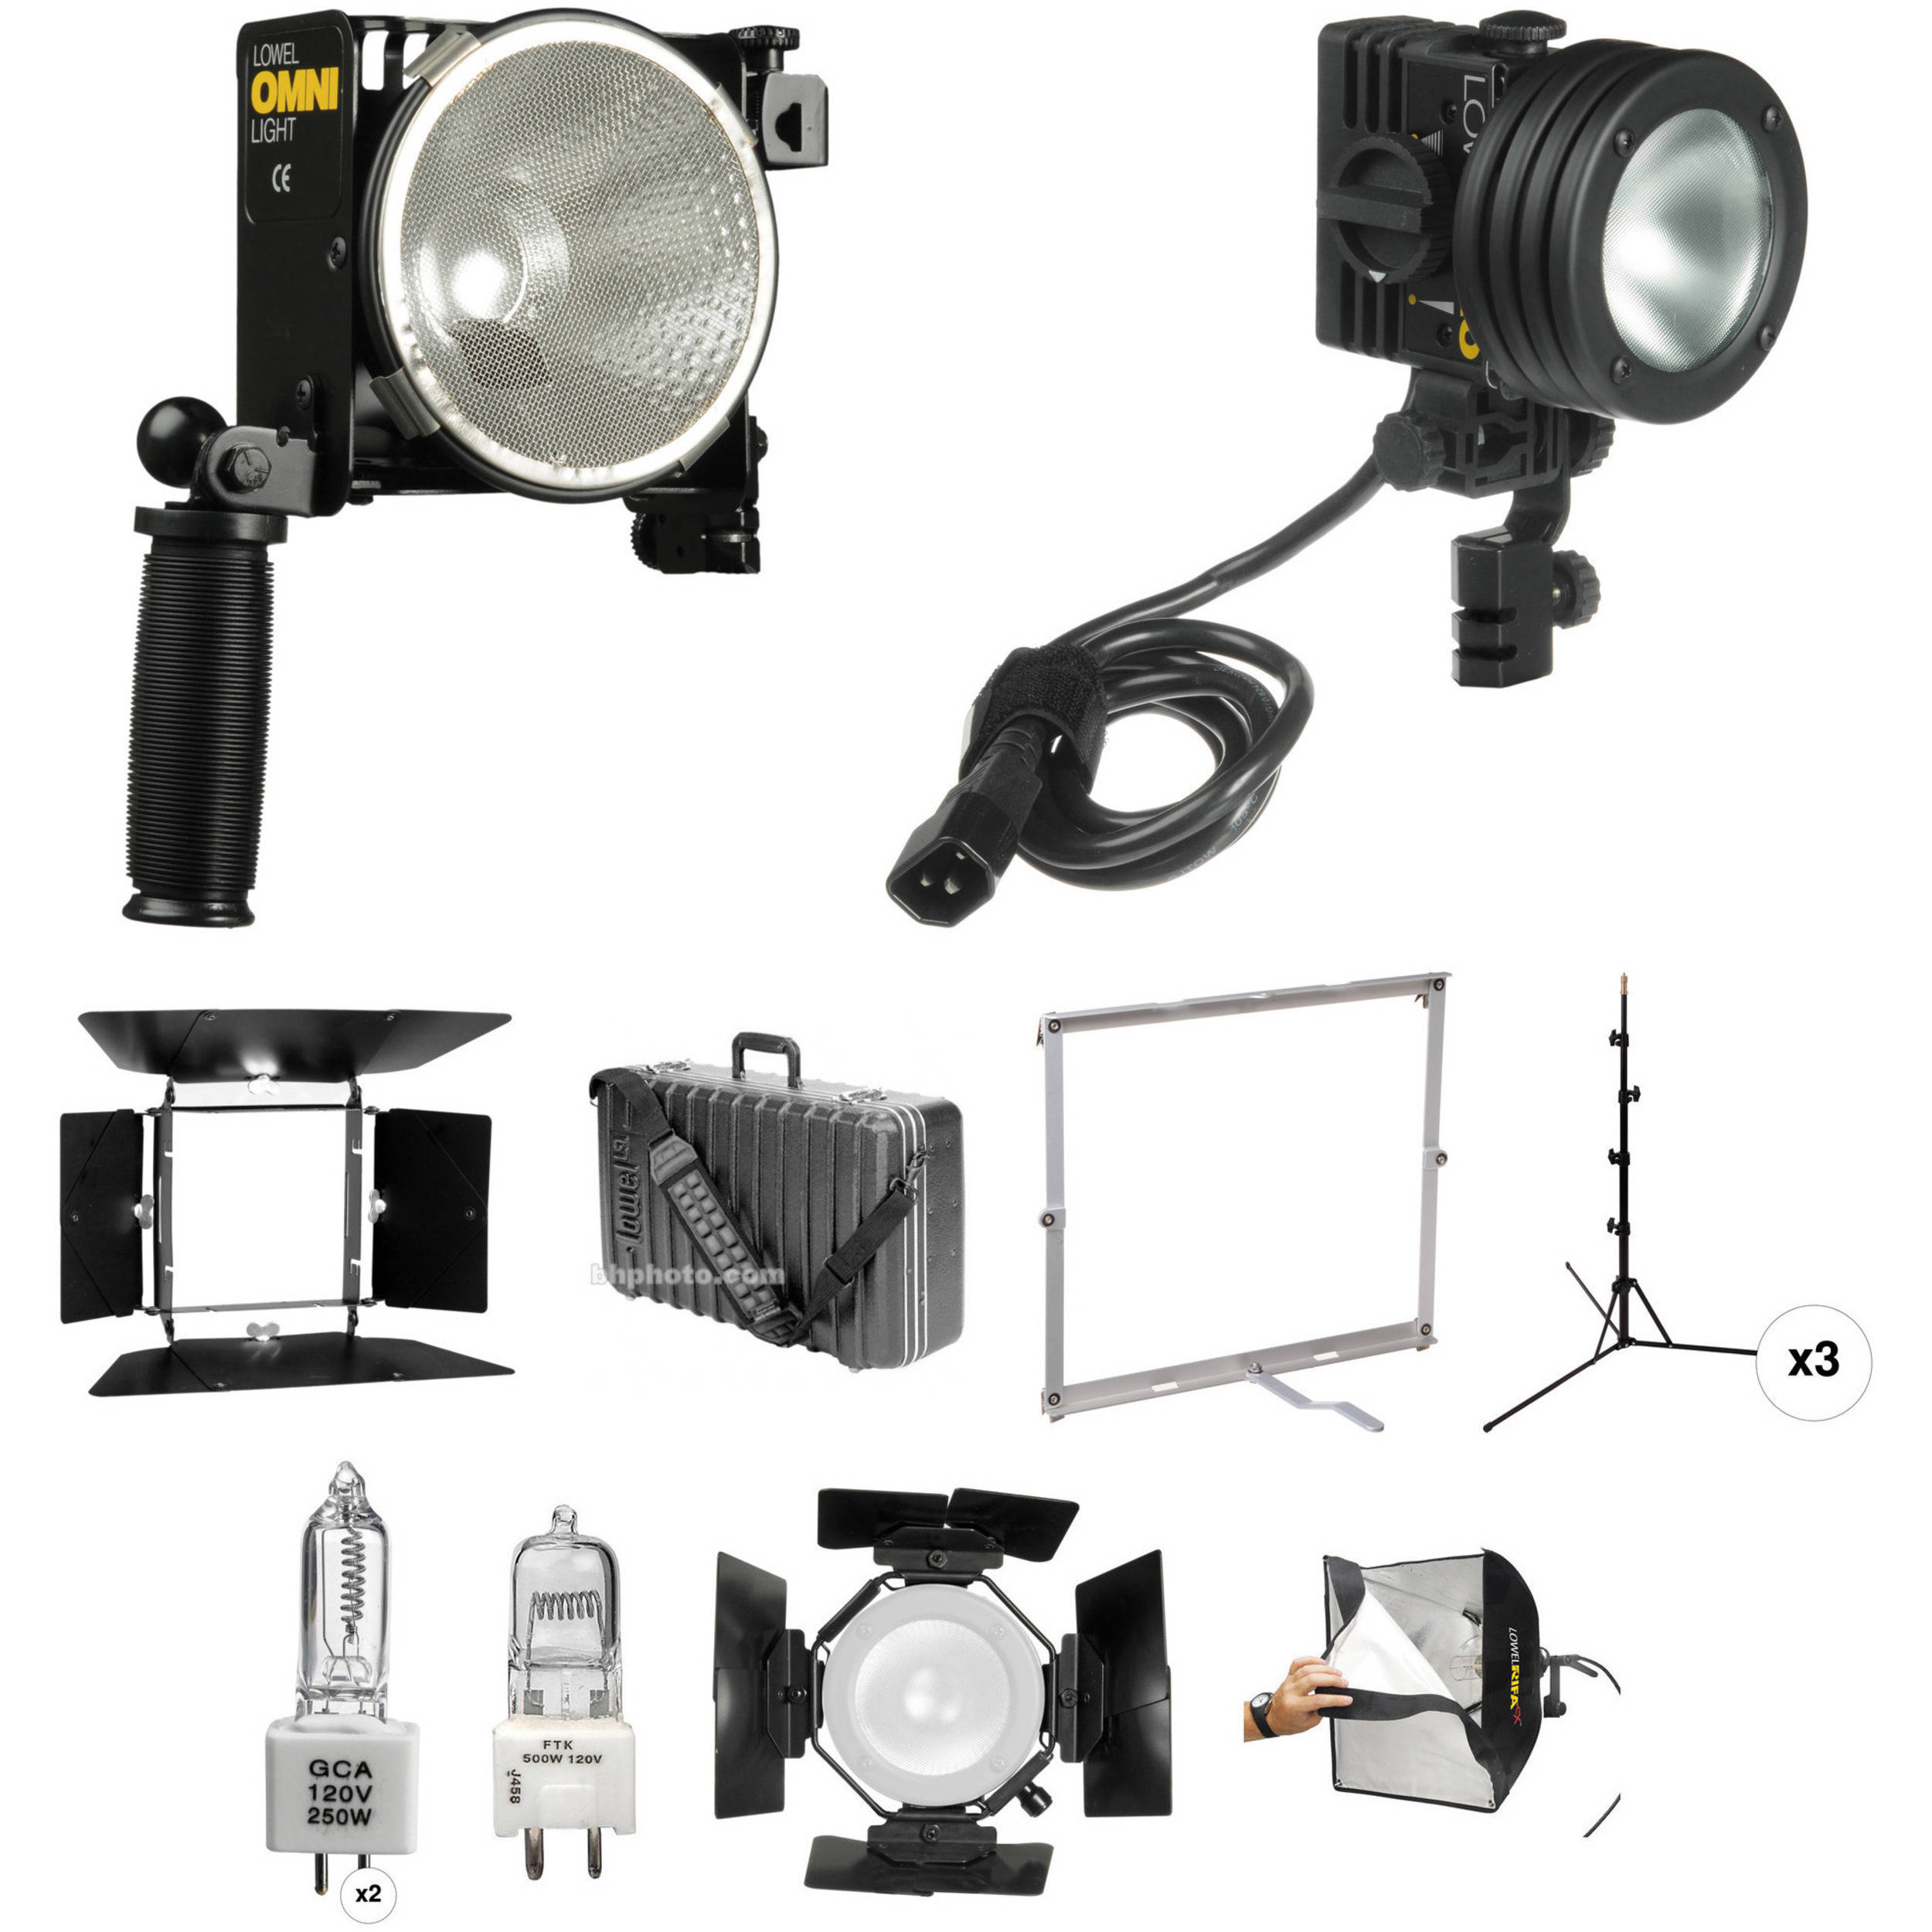 Lowel Omni Light, Pro Light, Rifa EX Three Light Kit